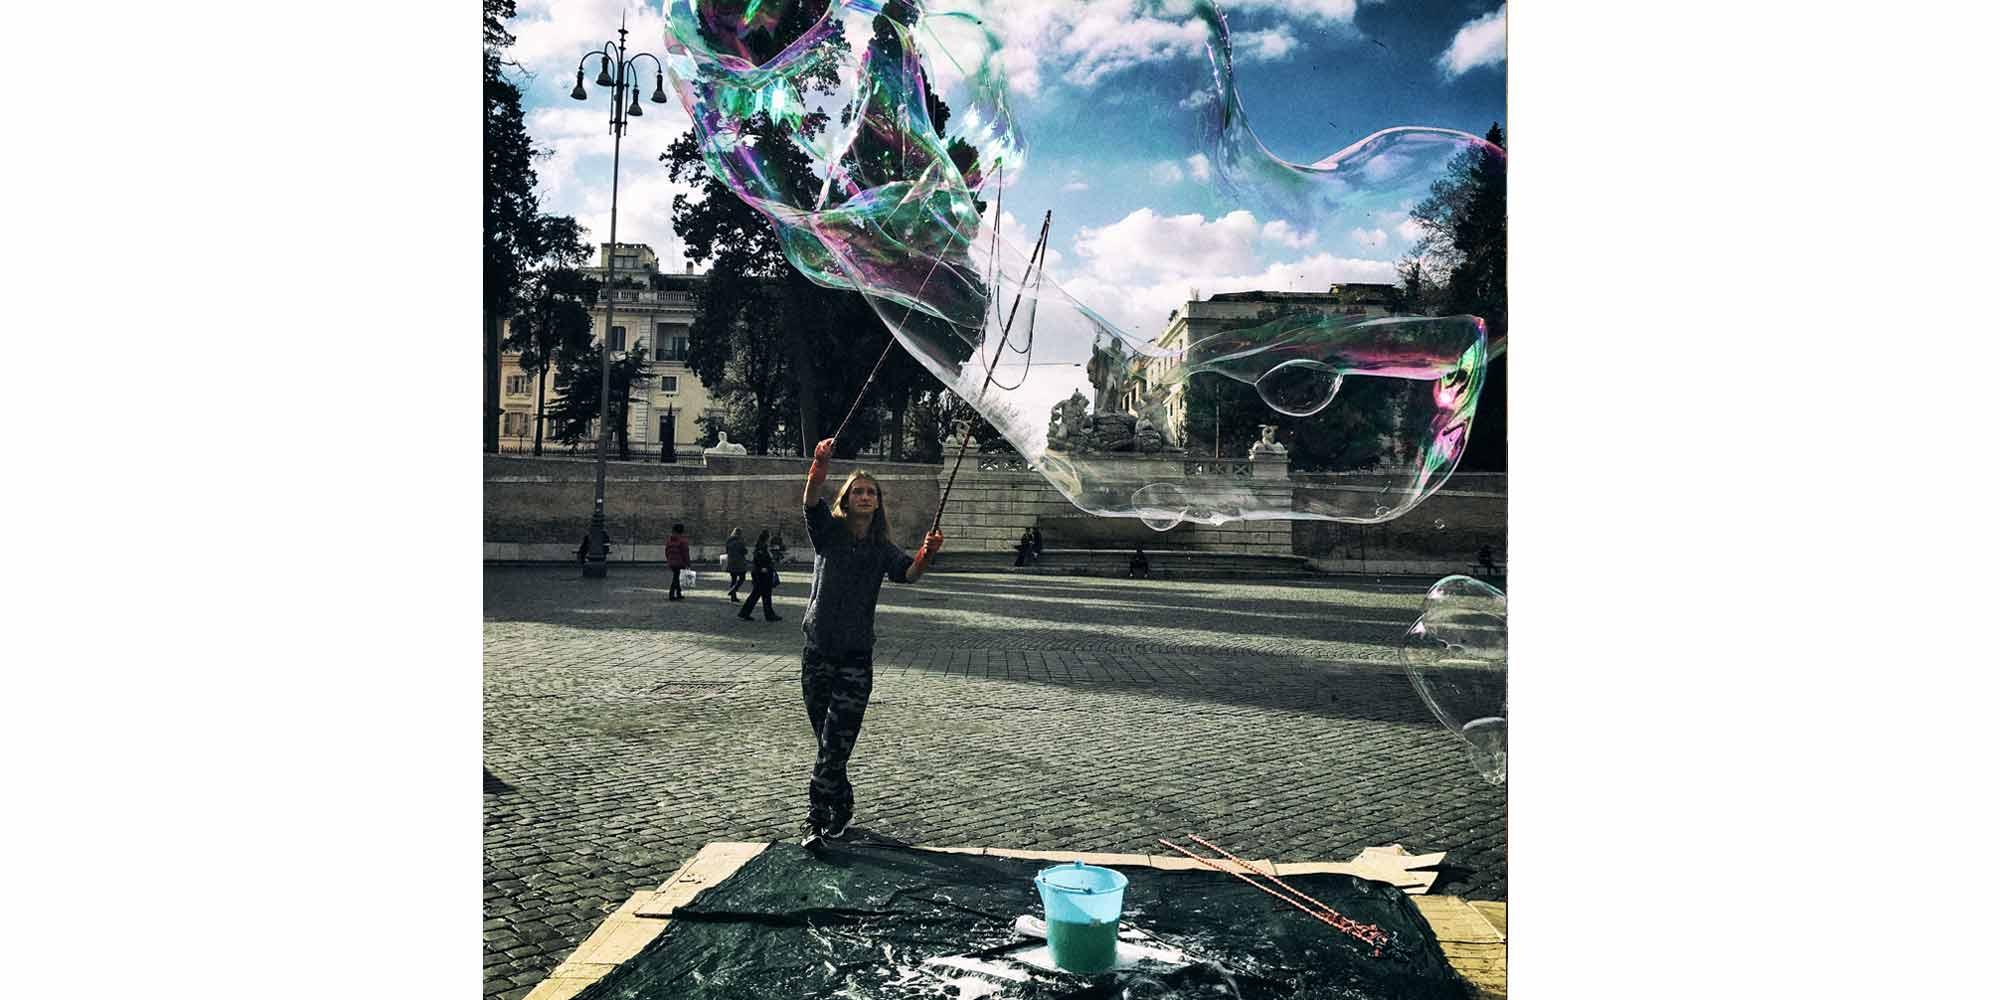 365-Foto-francesco-menghini-nel-2018-11